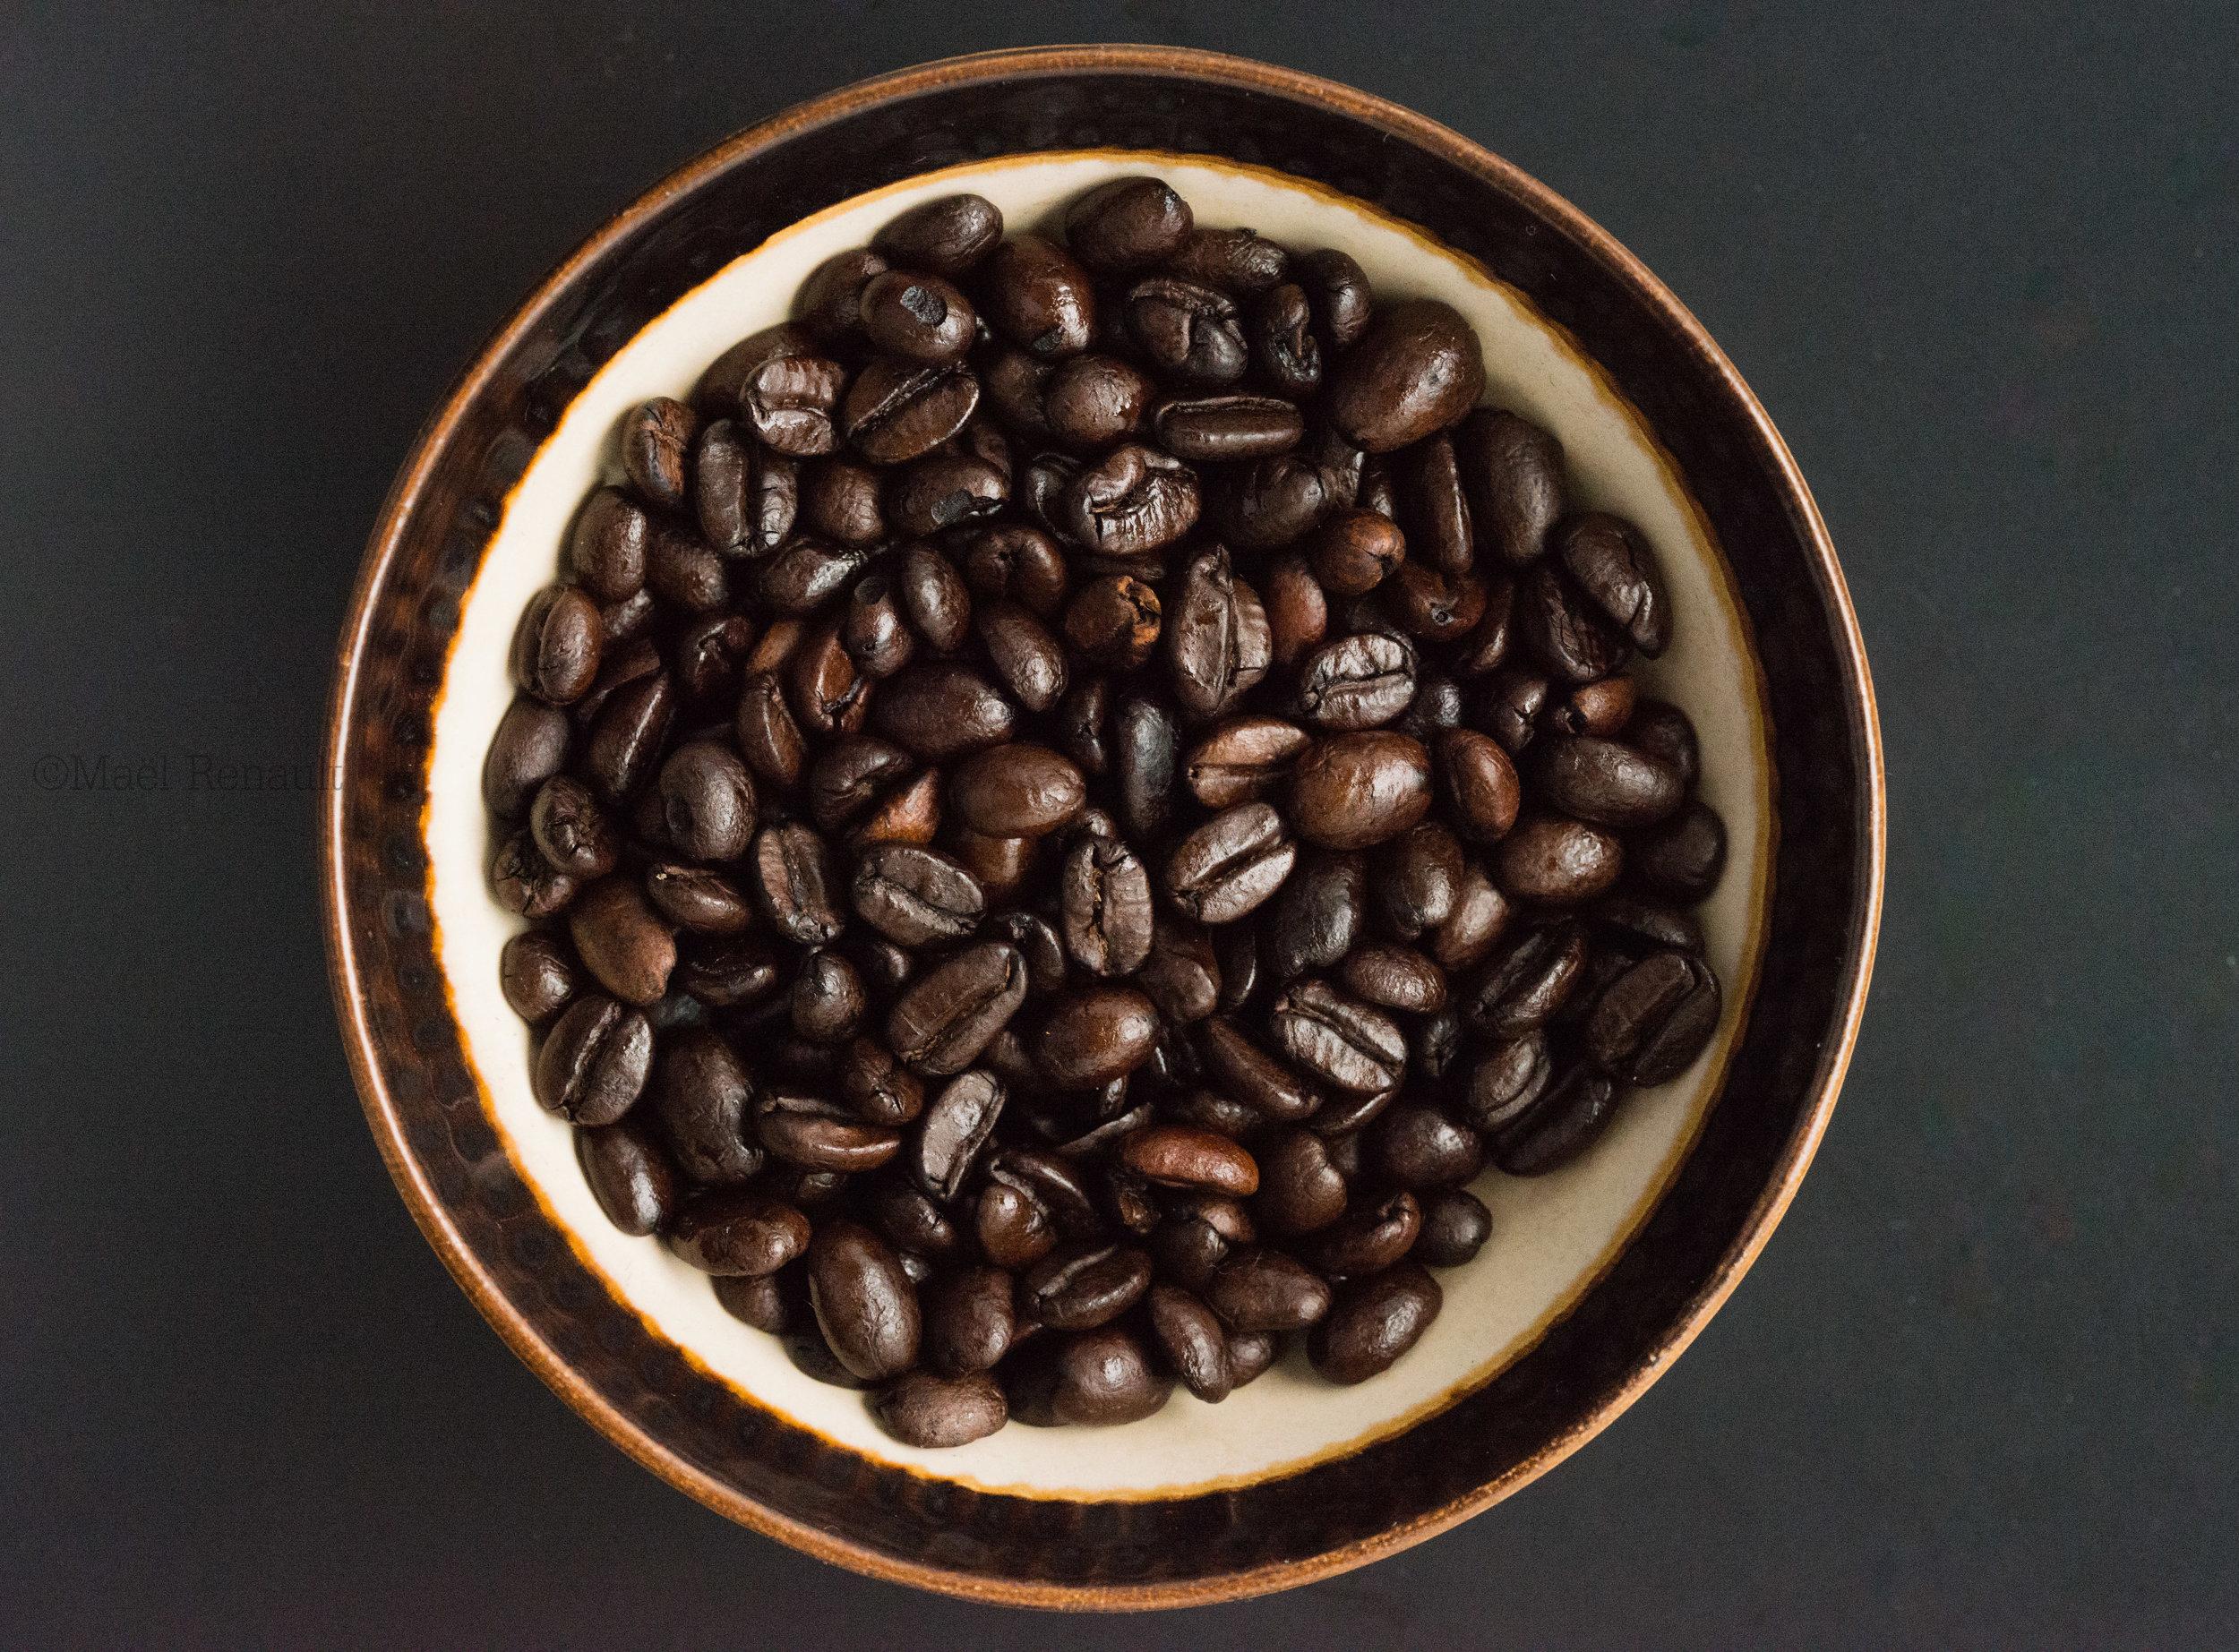 Coffee bean / Drink